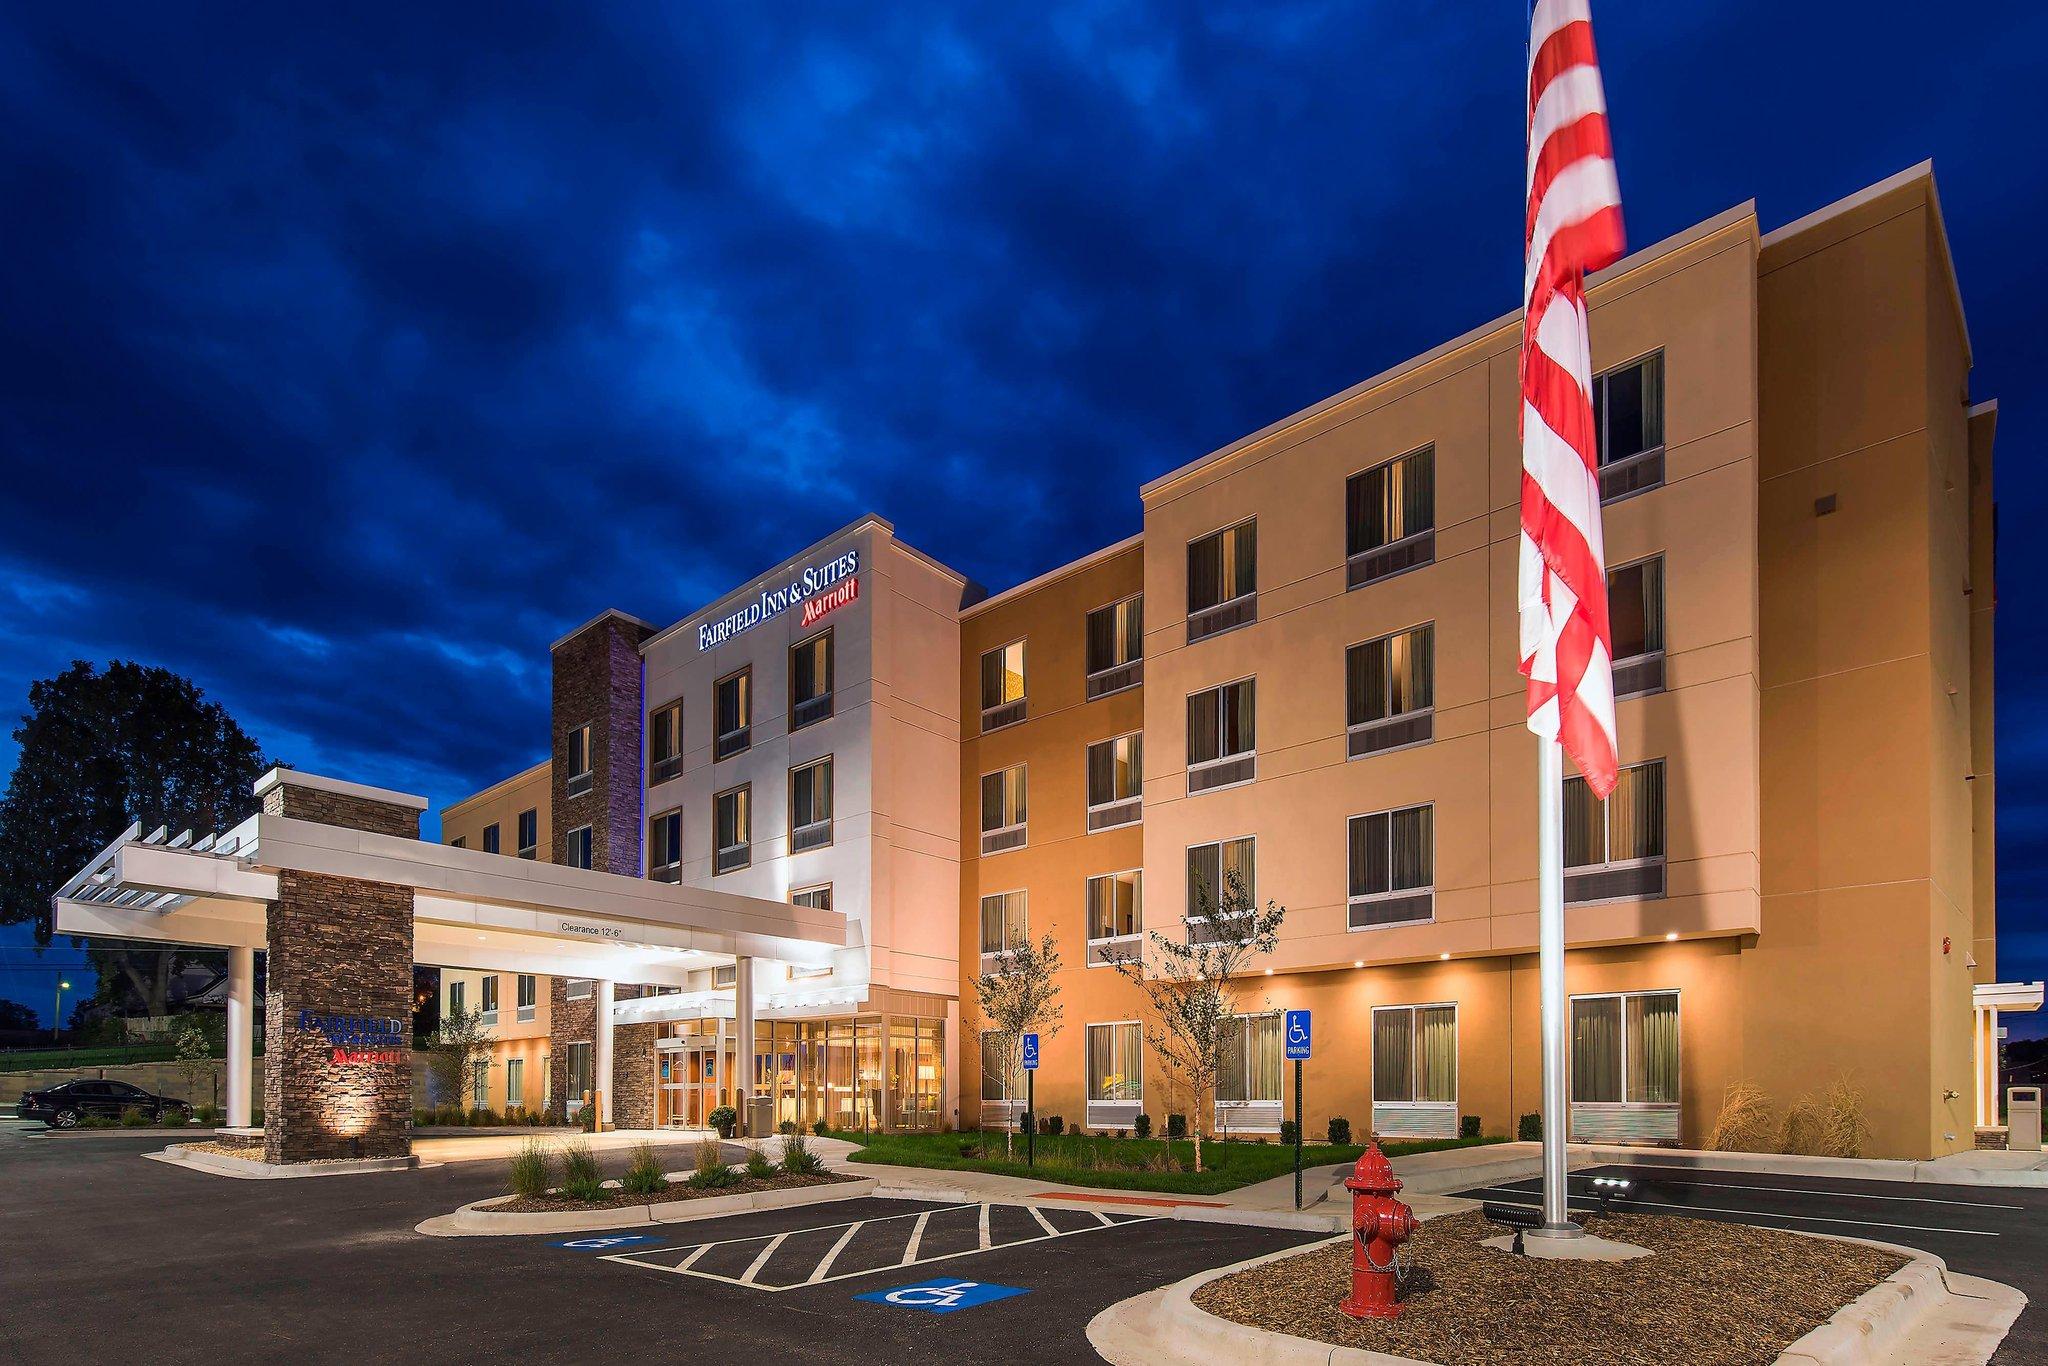 Fairfield Inn and Suites by Marriott Leavenworth